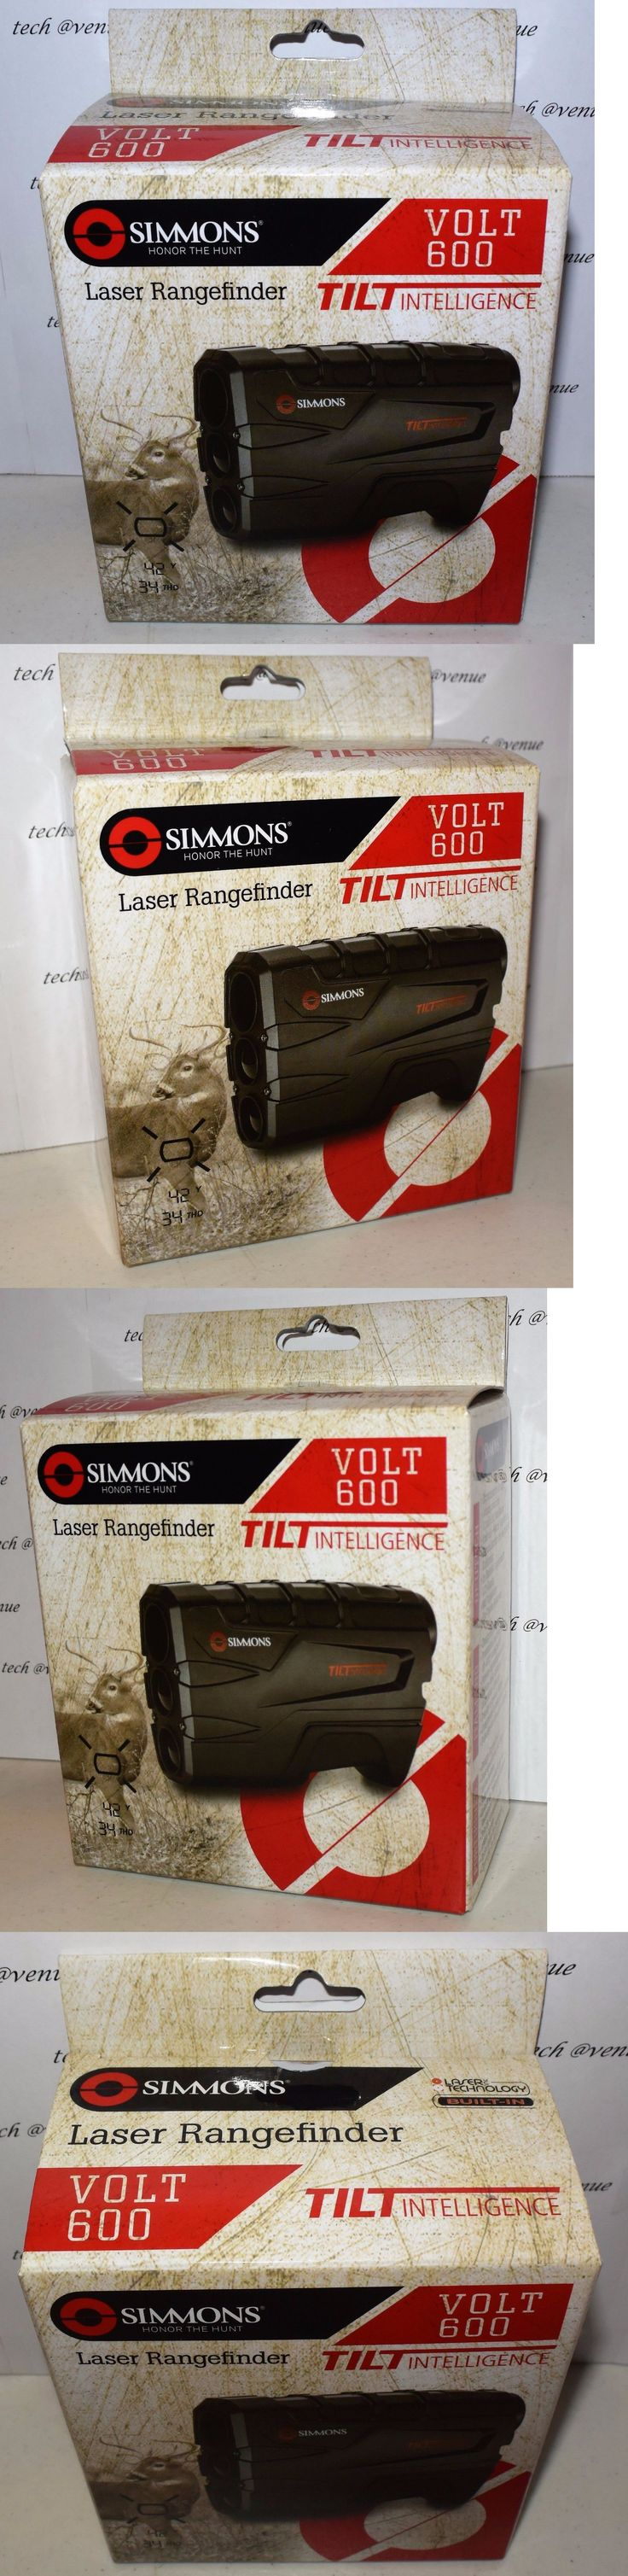 simmons volt 600 tilt. range finders 31712: simmons volt 600 laser rangefinder 801600t tilt intelligence new -\u003e buy it now only: $74.95 on ebay! | 31712 pinterest n